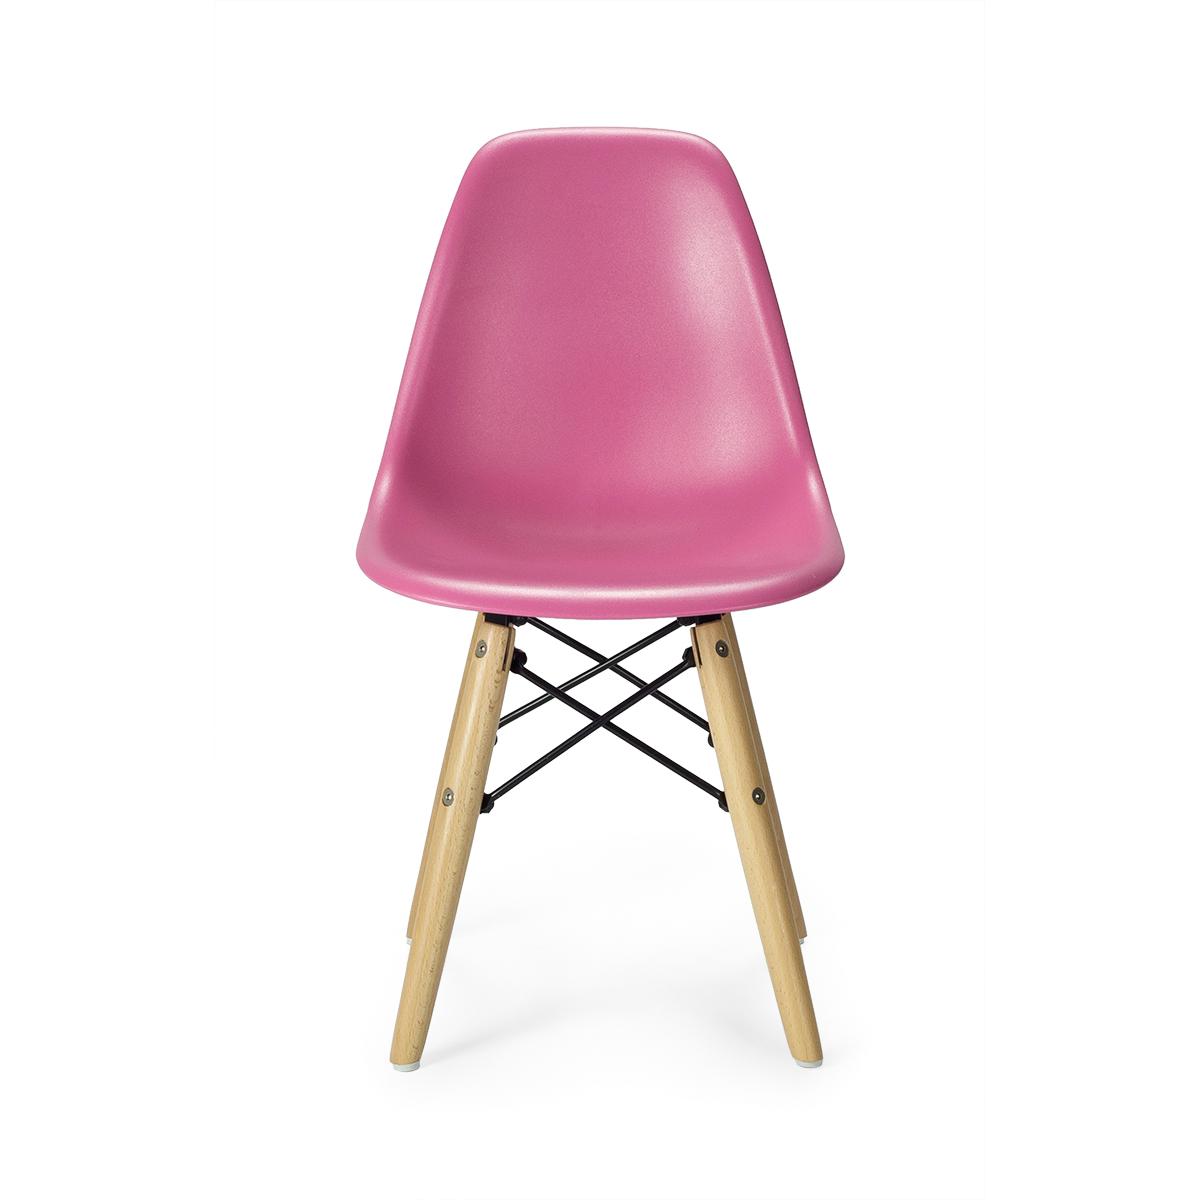 Silla ni os estilo eames rosa mobiliari contract - Sillas de estudio para ninos ...